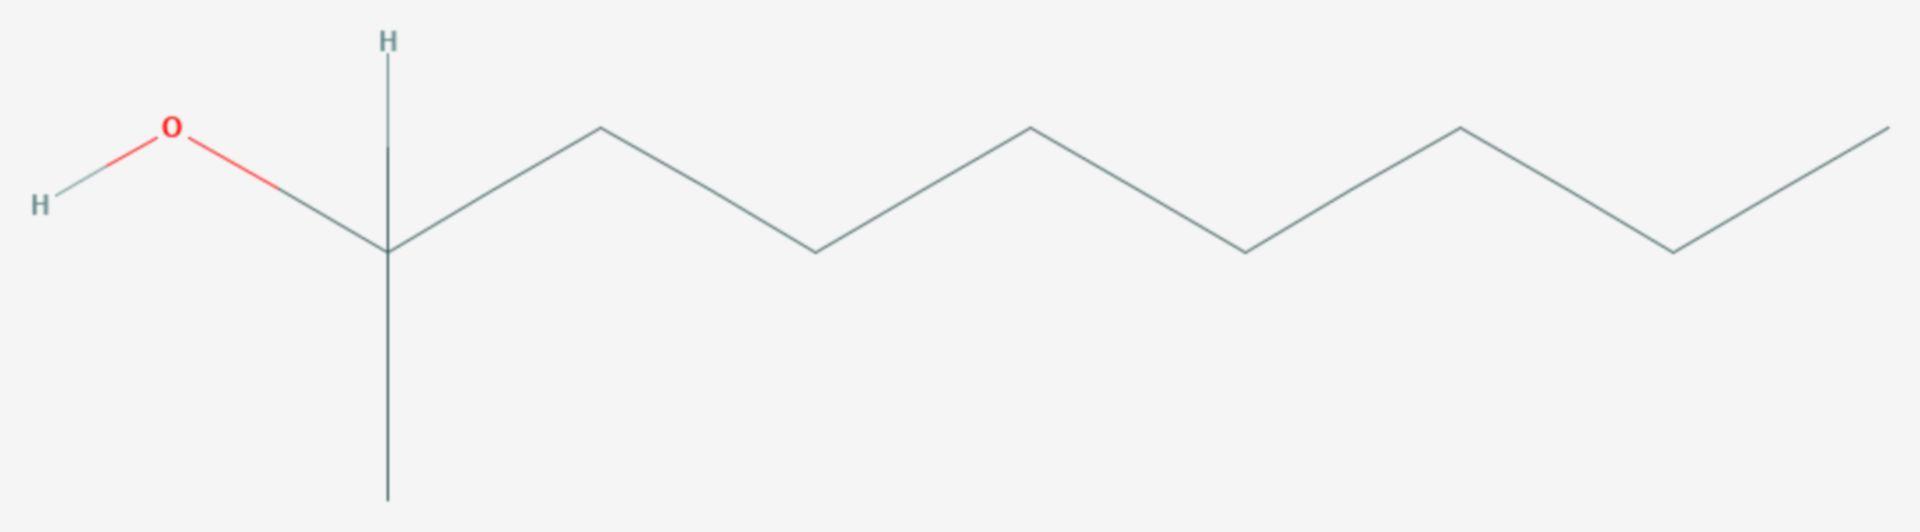 2-Nonanol (Strukturformel)